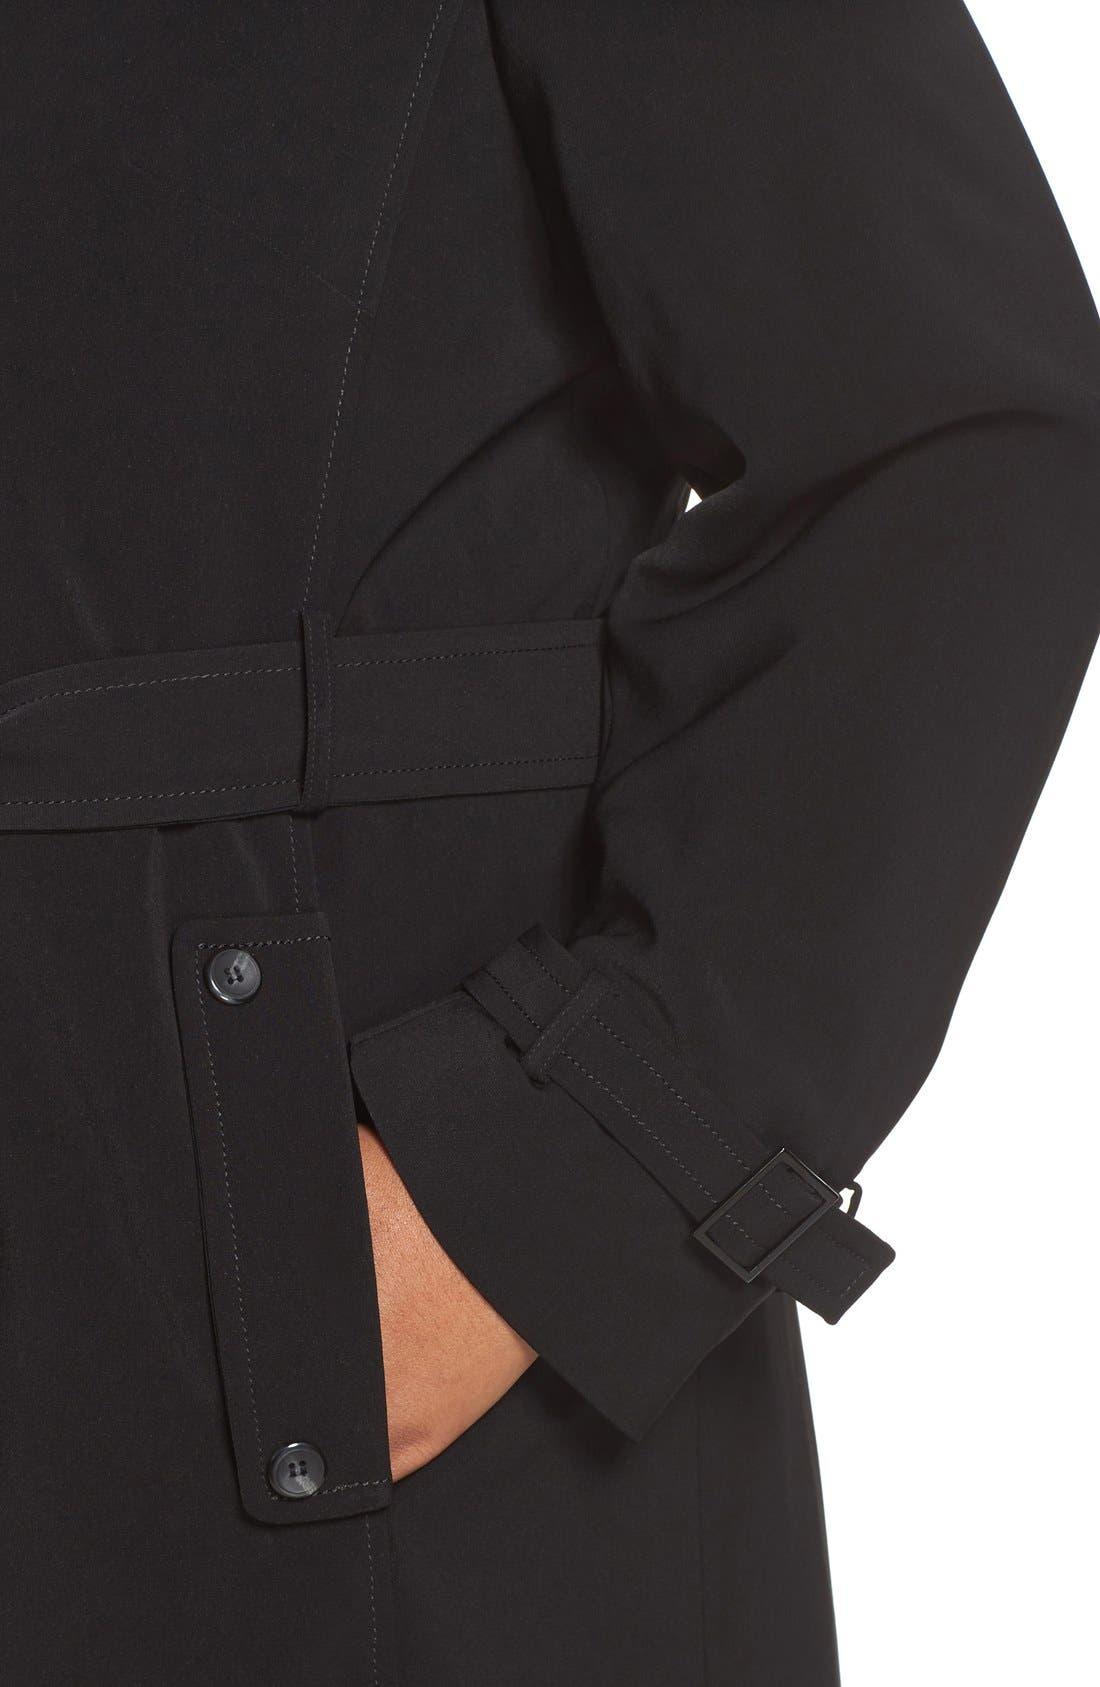 Long Nepage Raincoat with Detachable Hood & Liner,                             Alternate thumbnail 4, color,                             Black